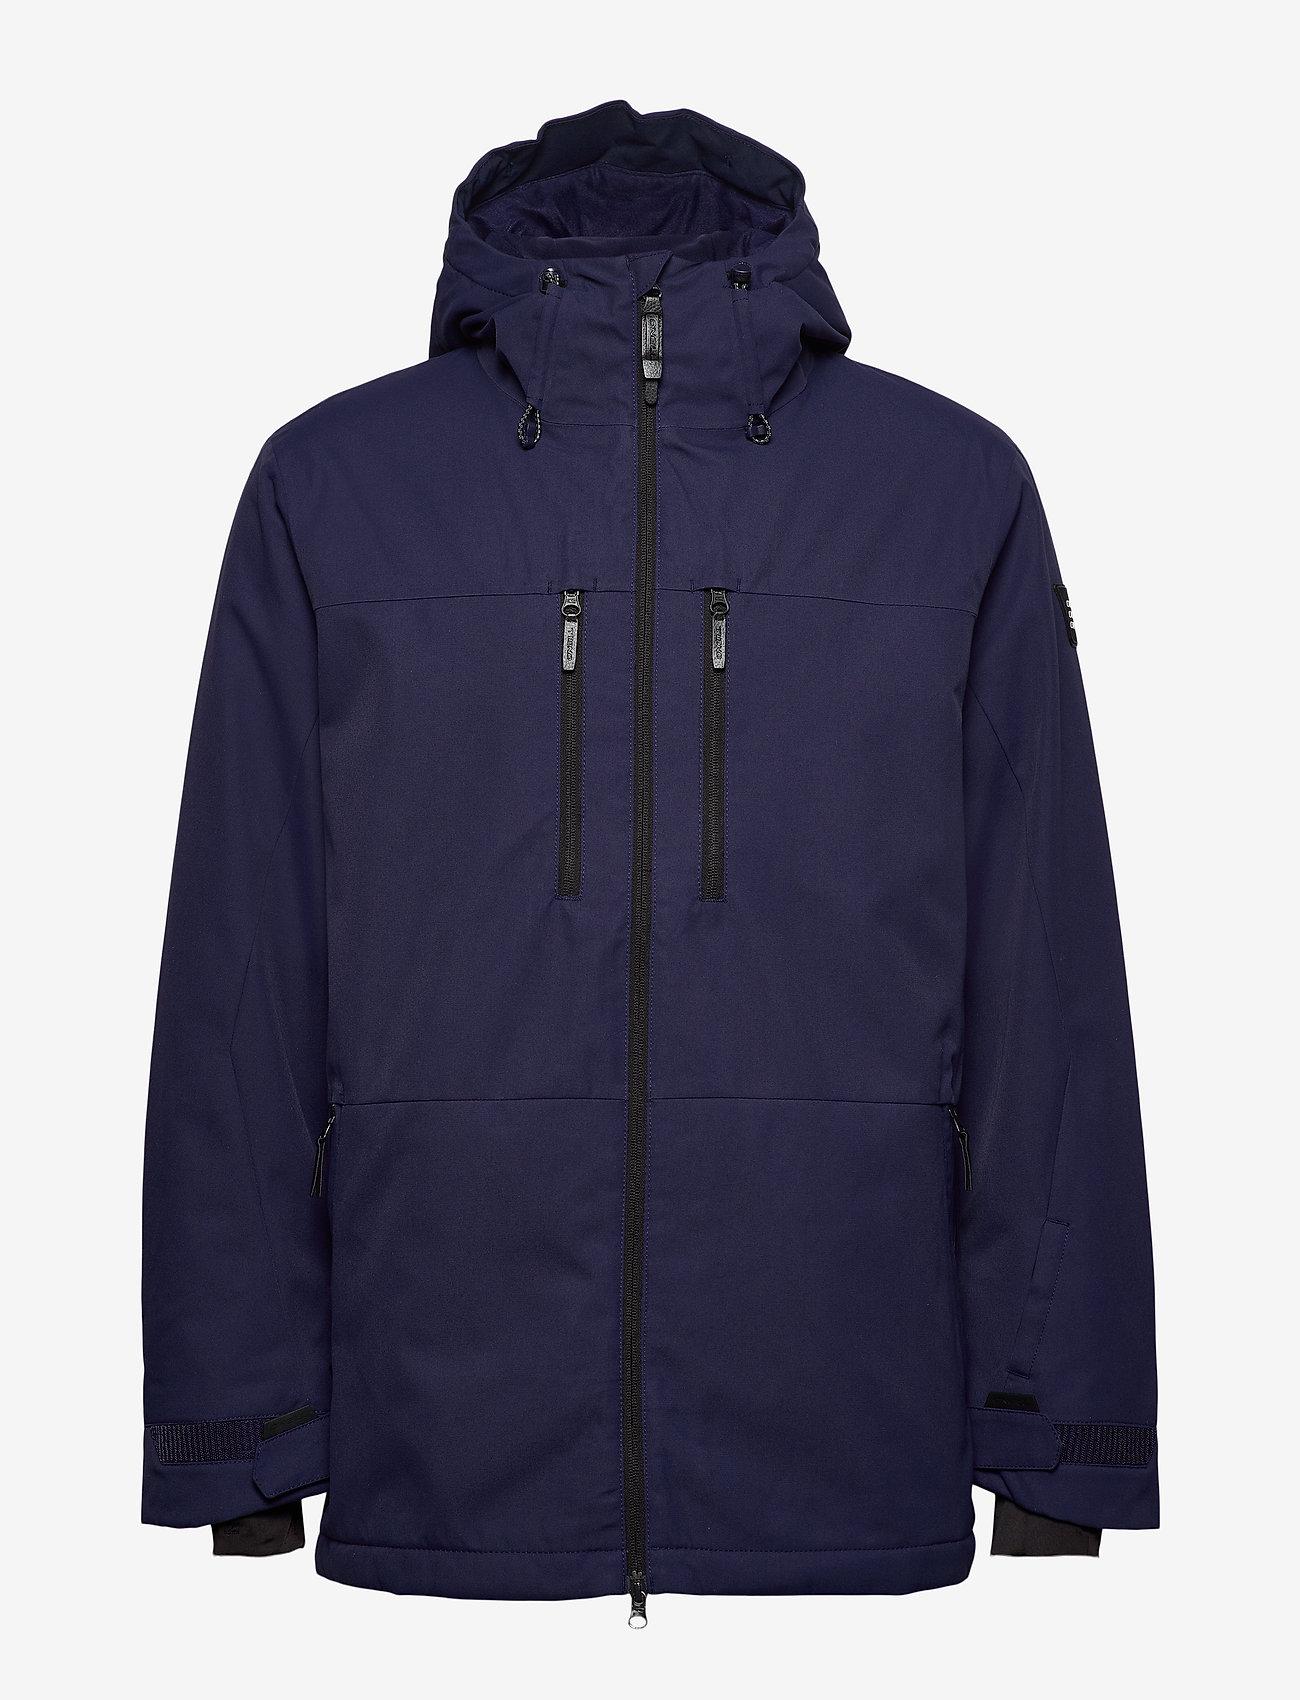 O'Neill - PM PHASED JACKET - skijakker - ink blue - 0